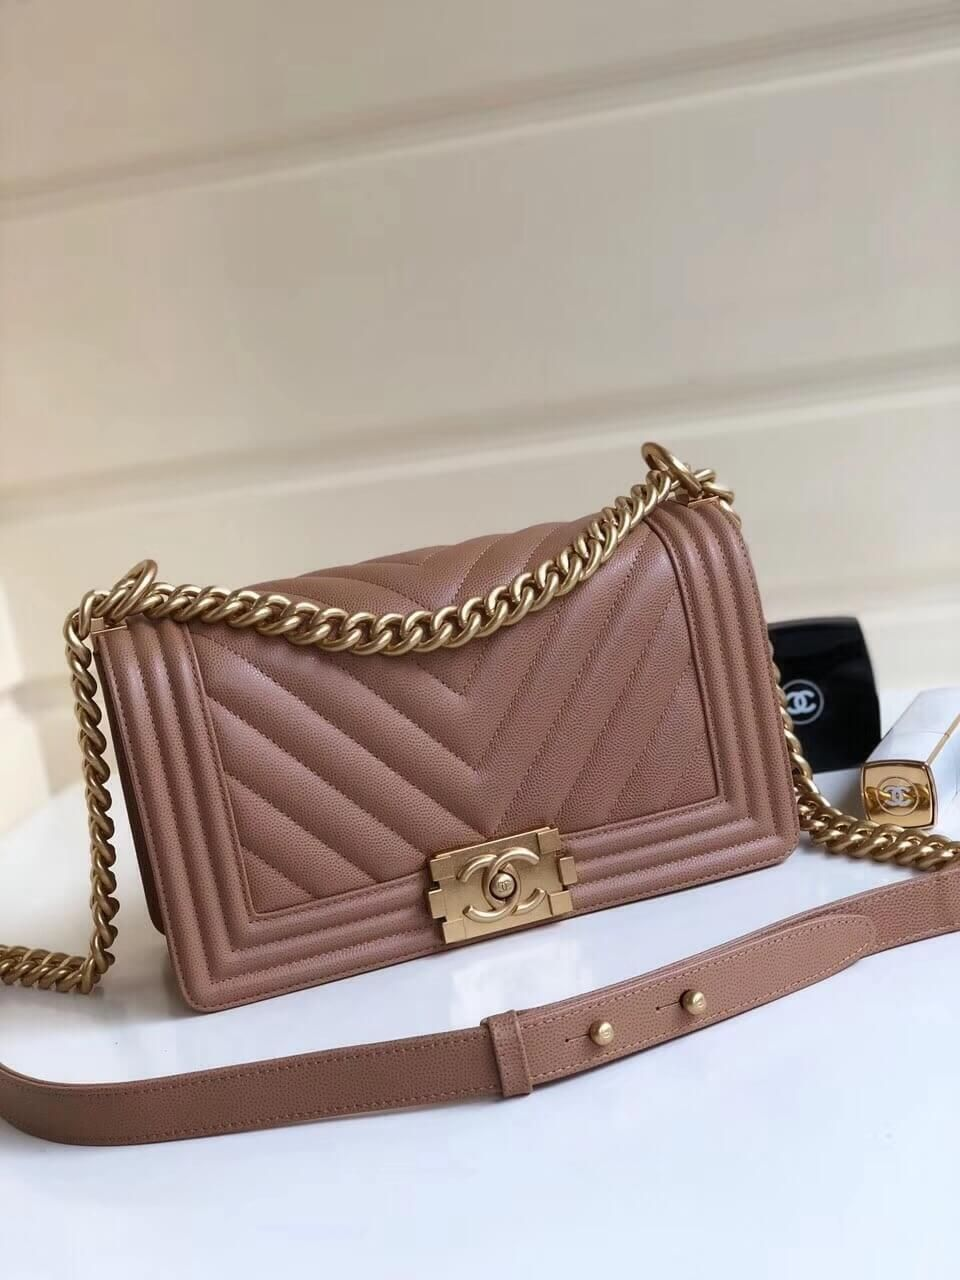 92df12749a227c Chanel Grained Calfskin Medium BOY CHANEL Handbag with Gold-tone Metal  Kahki 2018